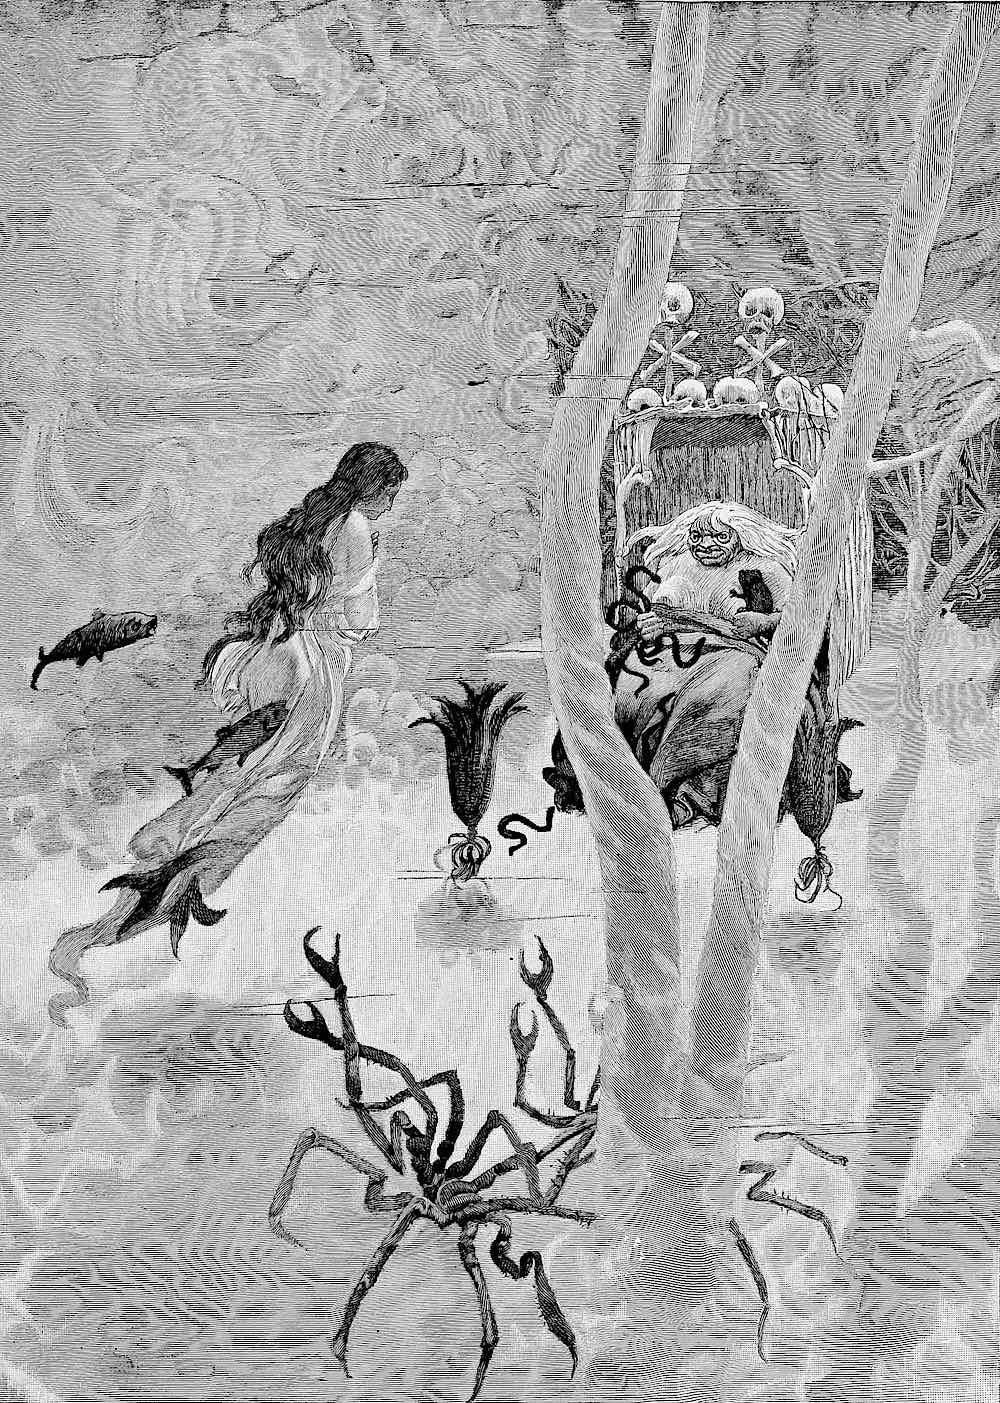 an underwater illustration from a German children's book 1900